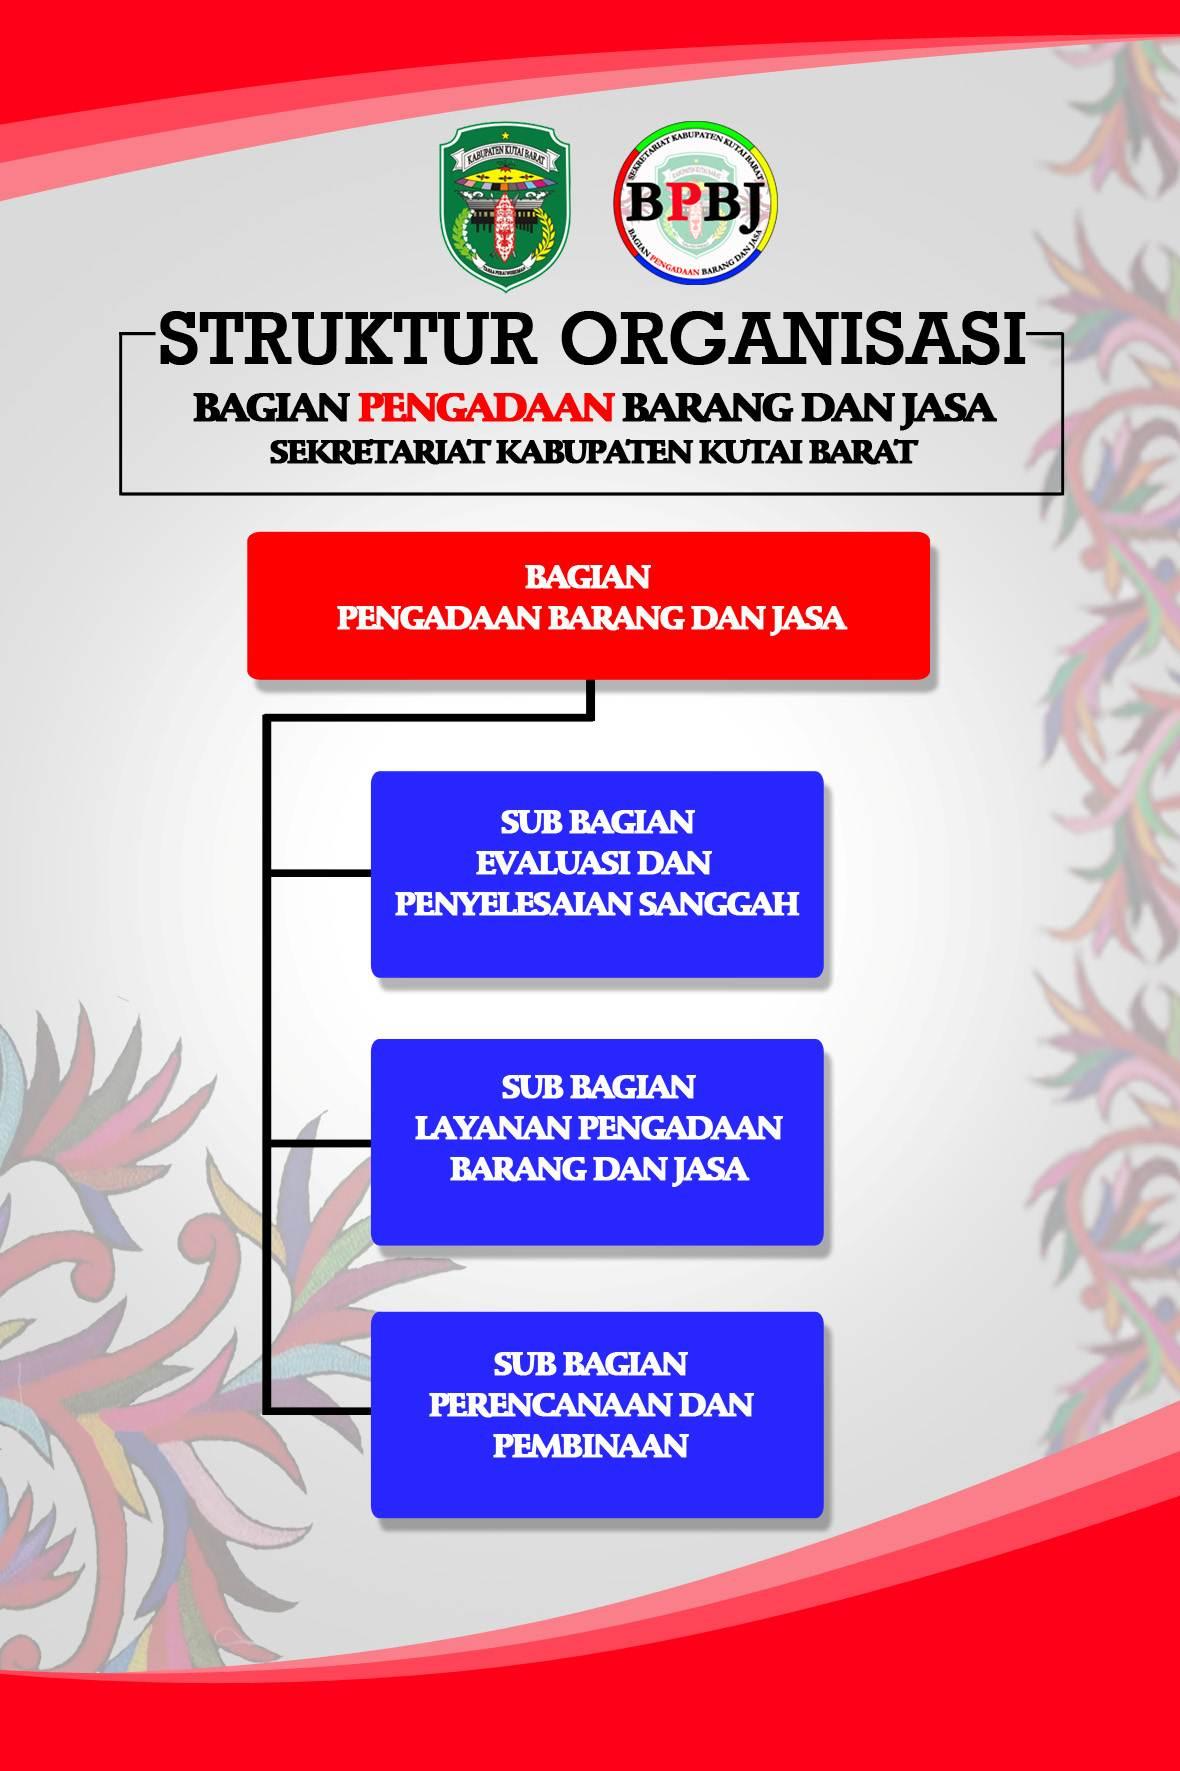 Struktur Organisasi - Bagian Pengadaan Barang dan Jasa